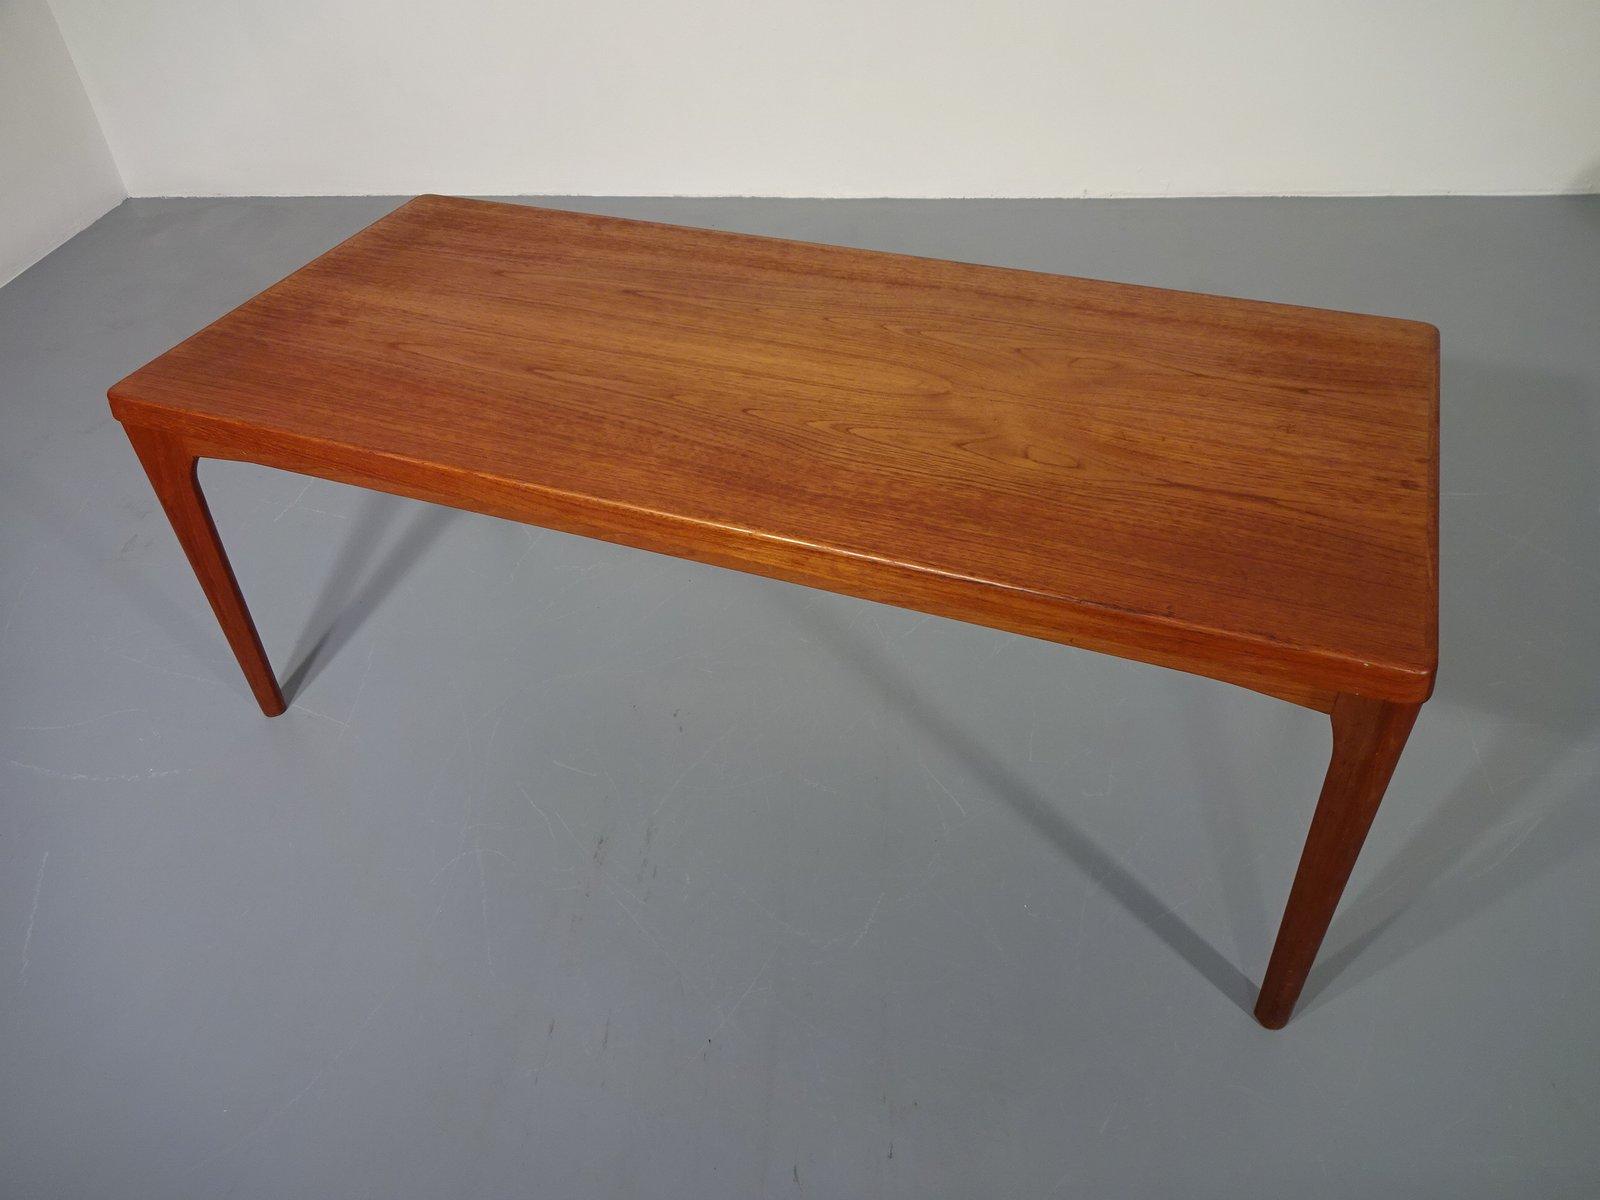 Vintage Teak Coffee Table By Henning Kjaernulf For Velje Mobelfabrik For Sale At Pamono